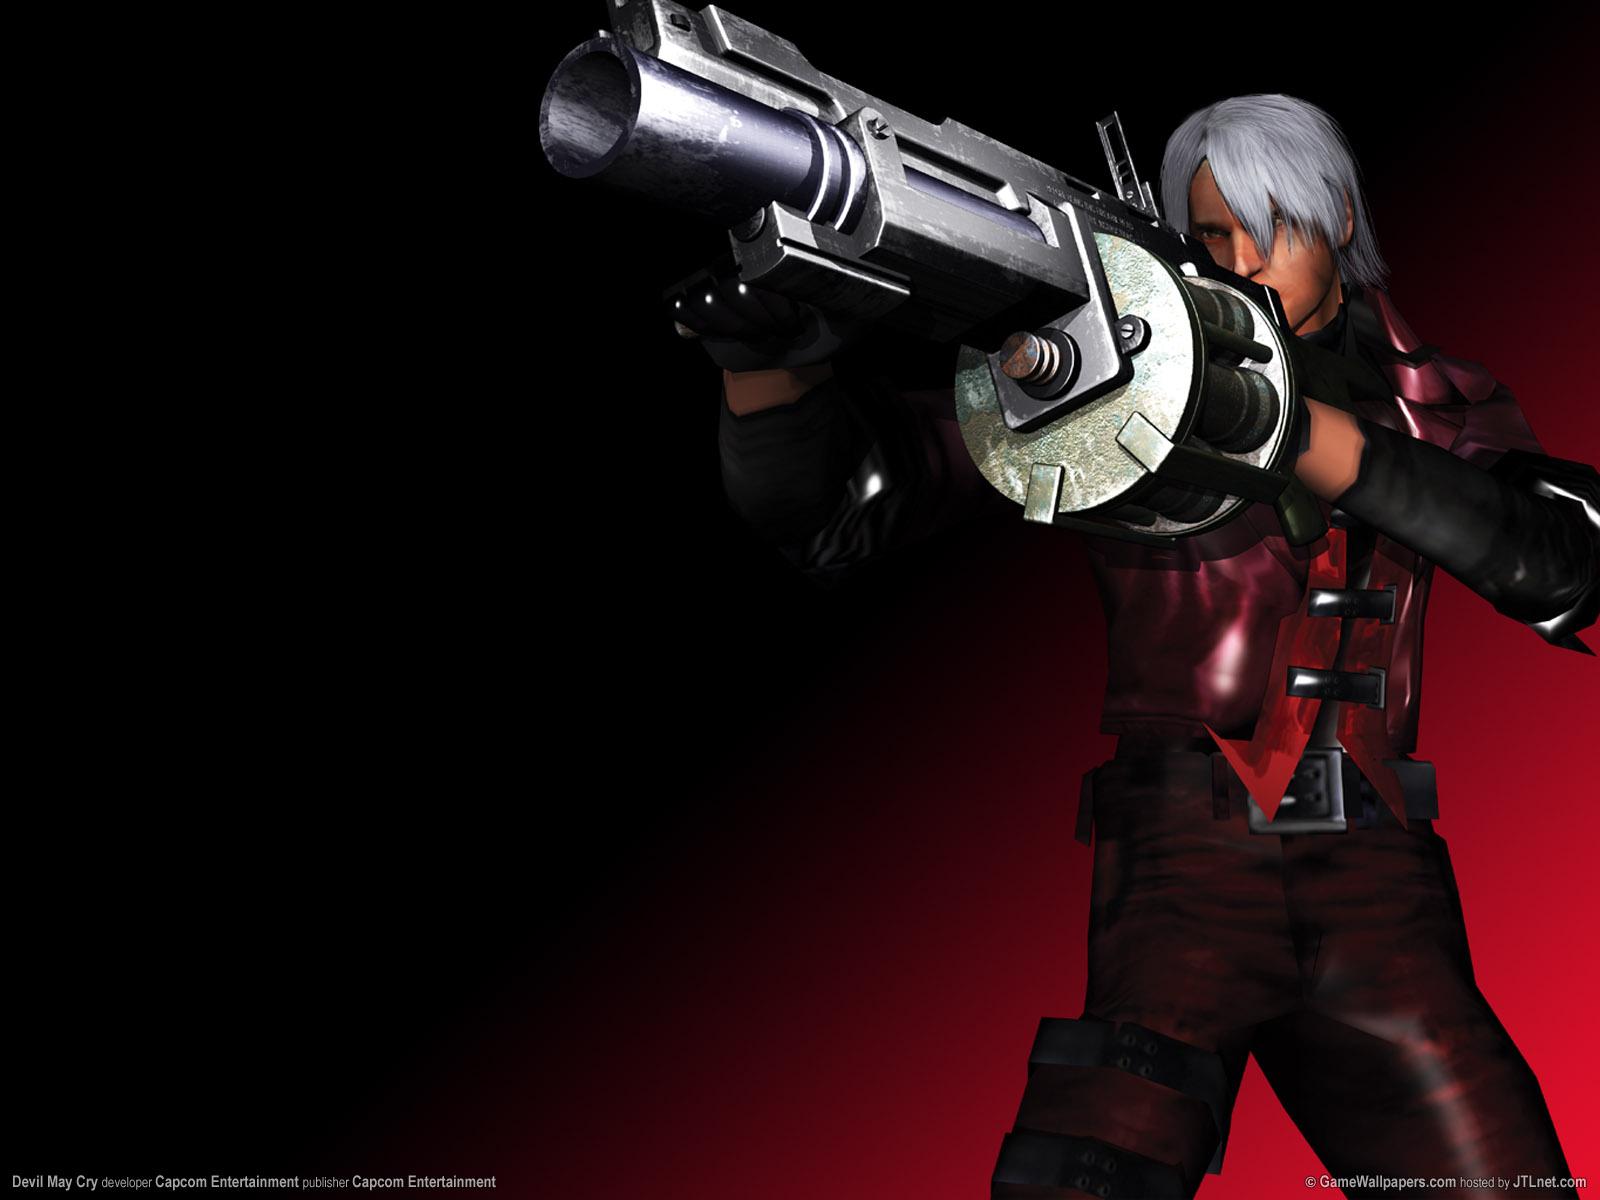 Devil May Cry Dante Wallpaper: Gamers Zone: December 2010